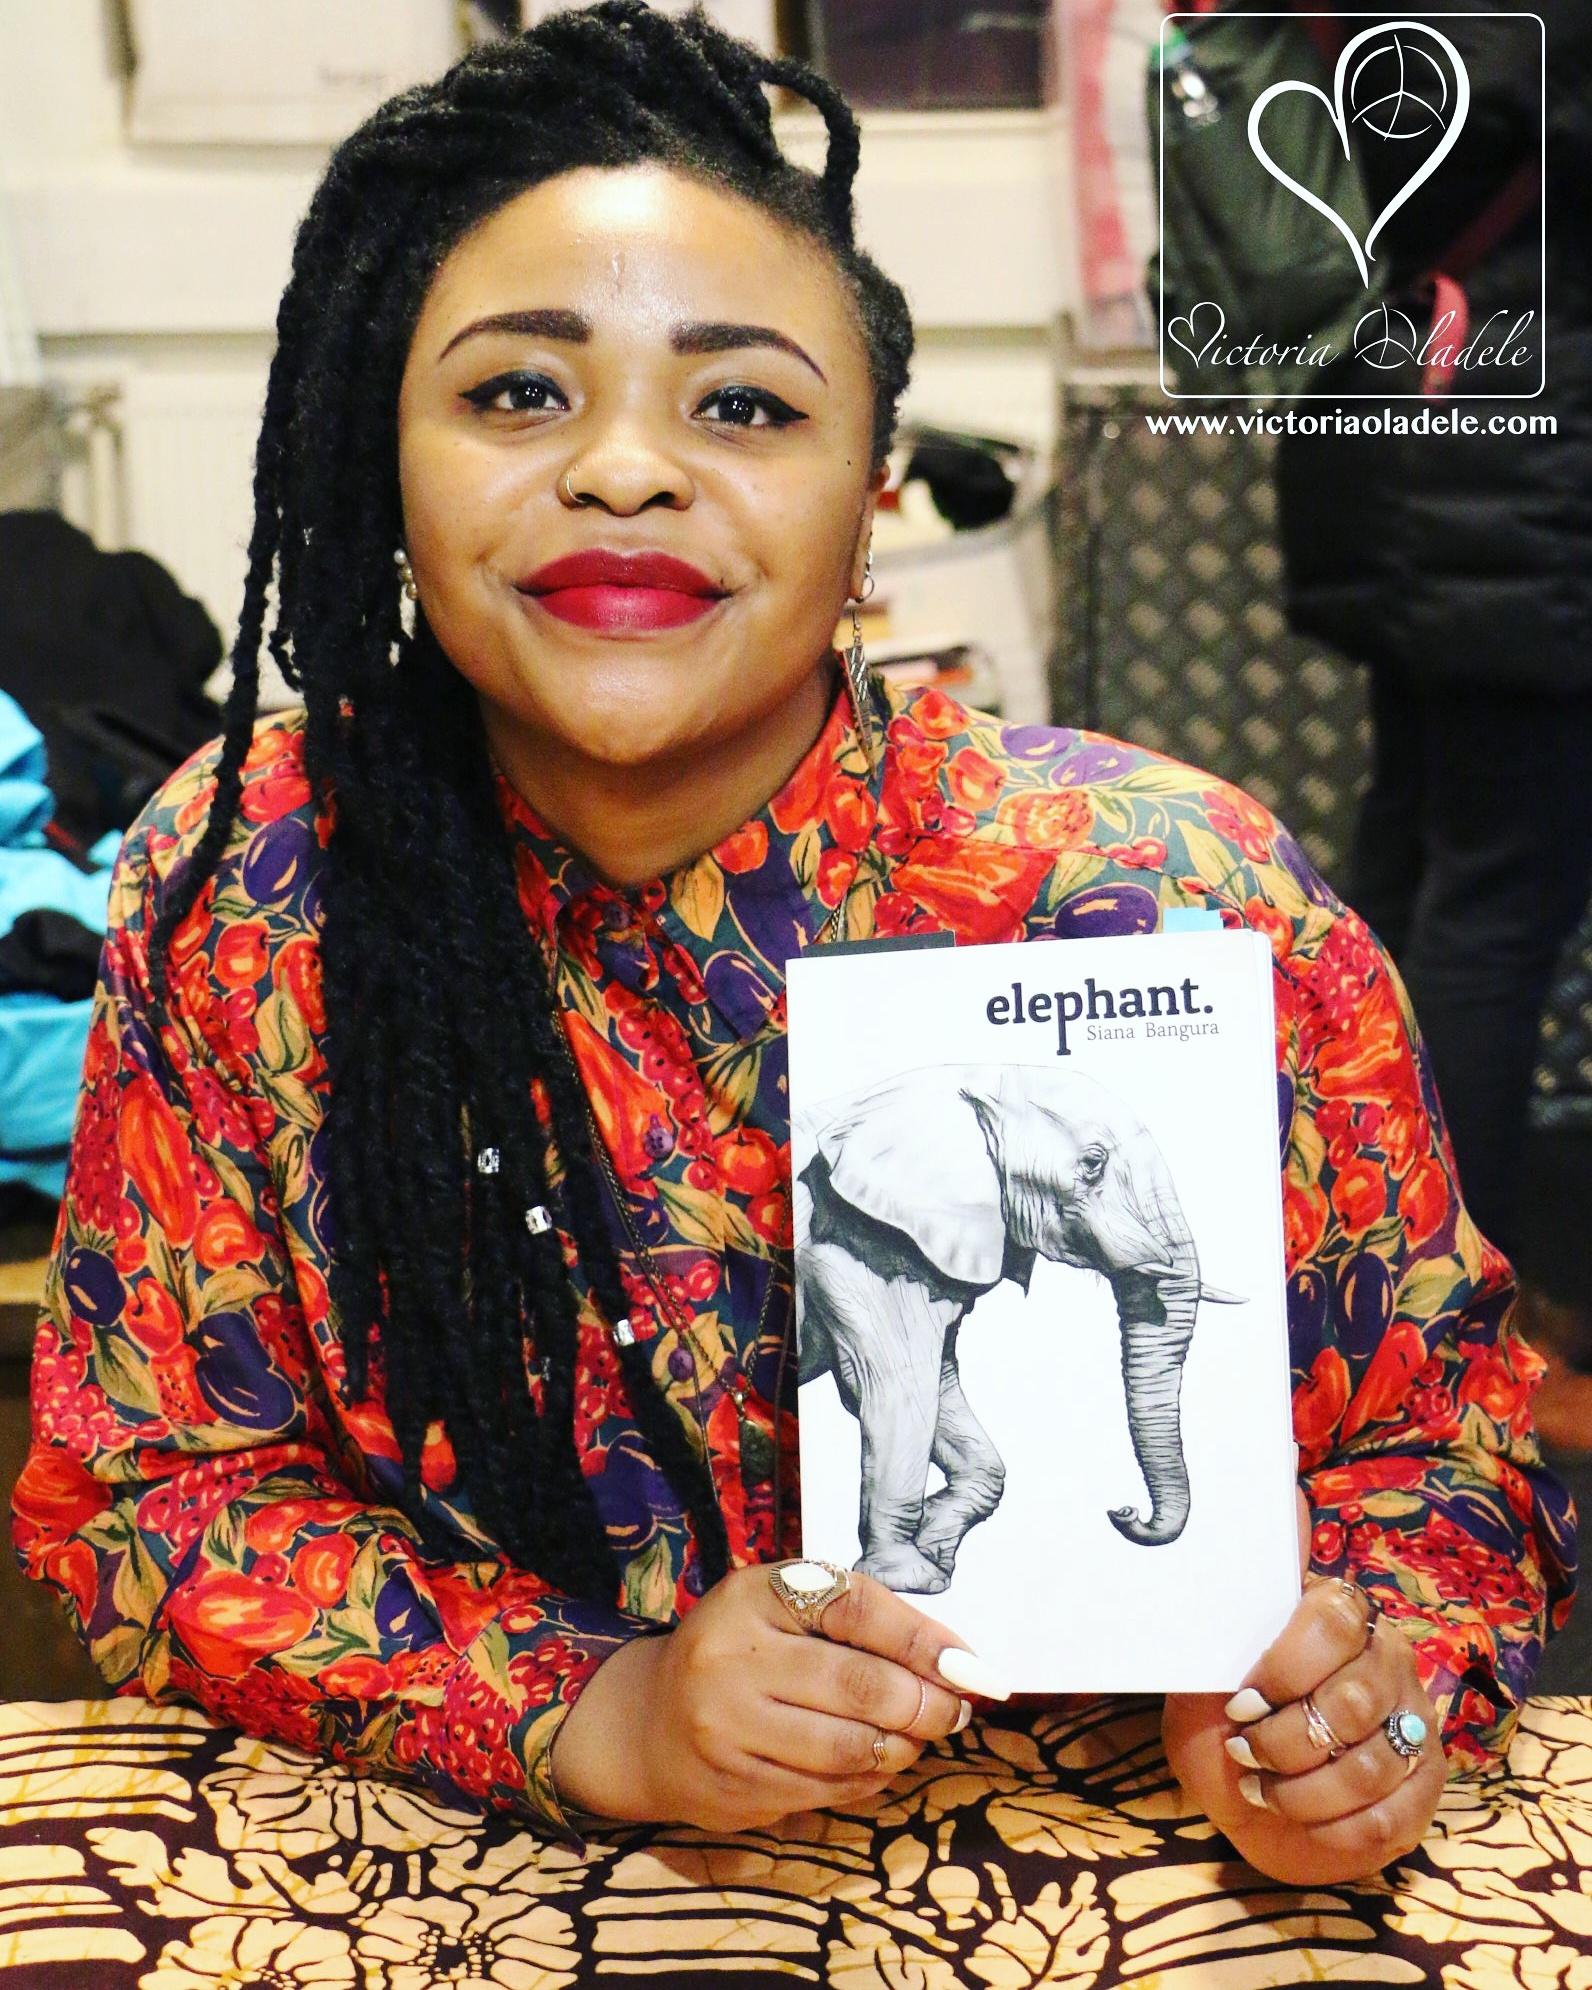 Siana holding Elephant